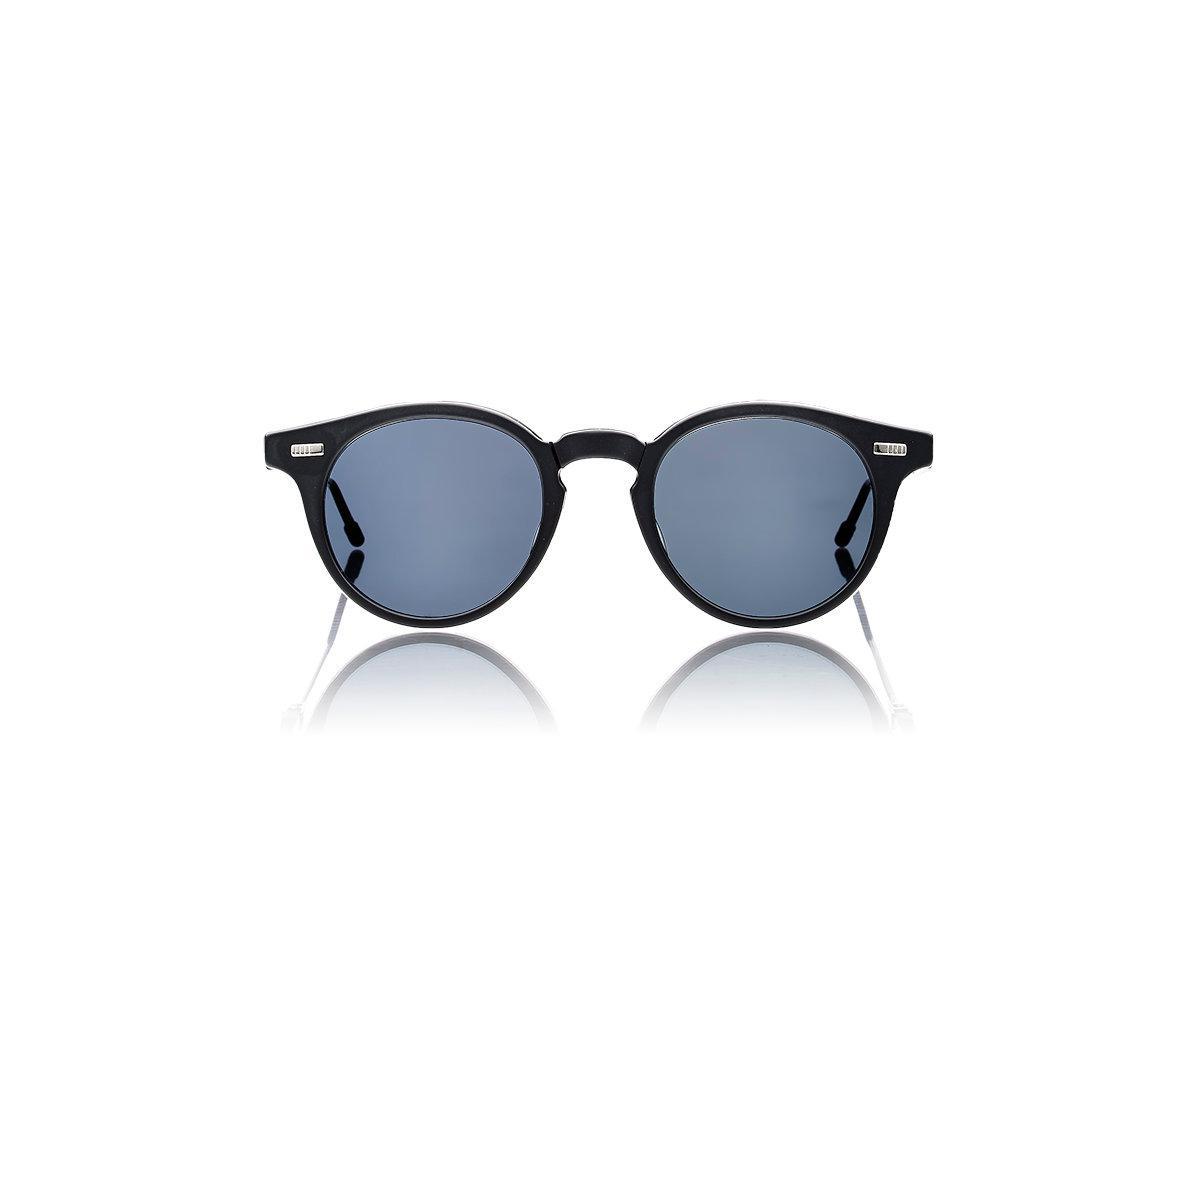 193579dd8db Lyst - Thom Browne Folding Sunglasses in Black for Men